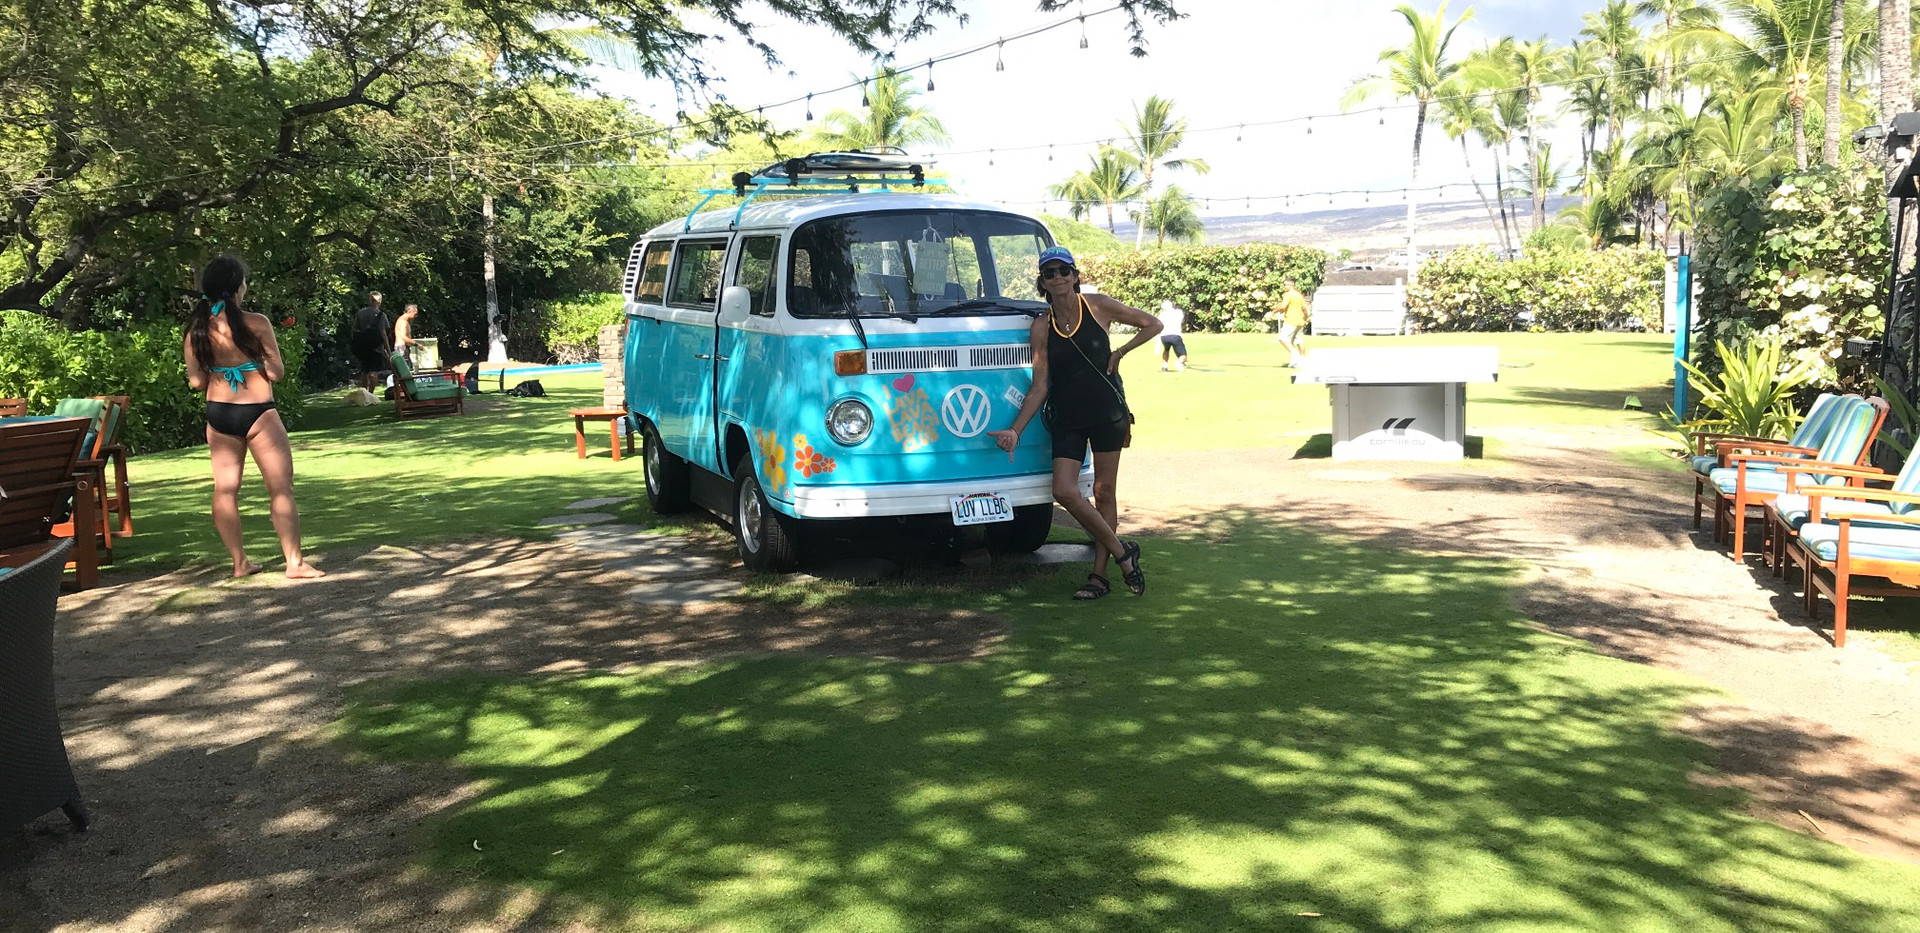 Gotta Love the VW Van